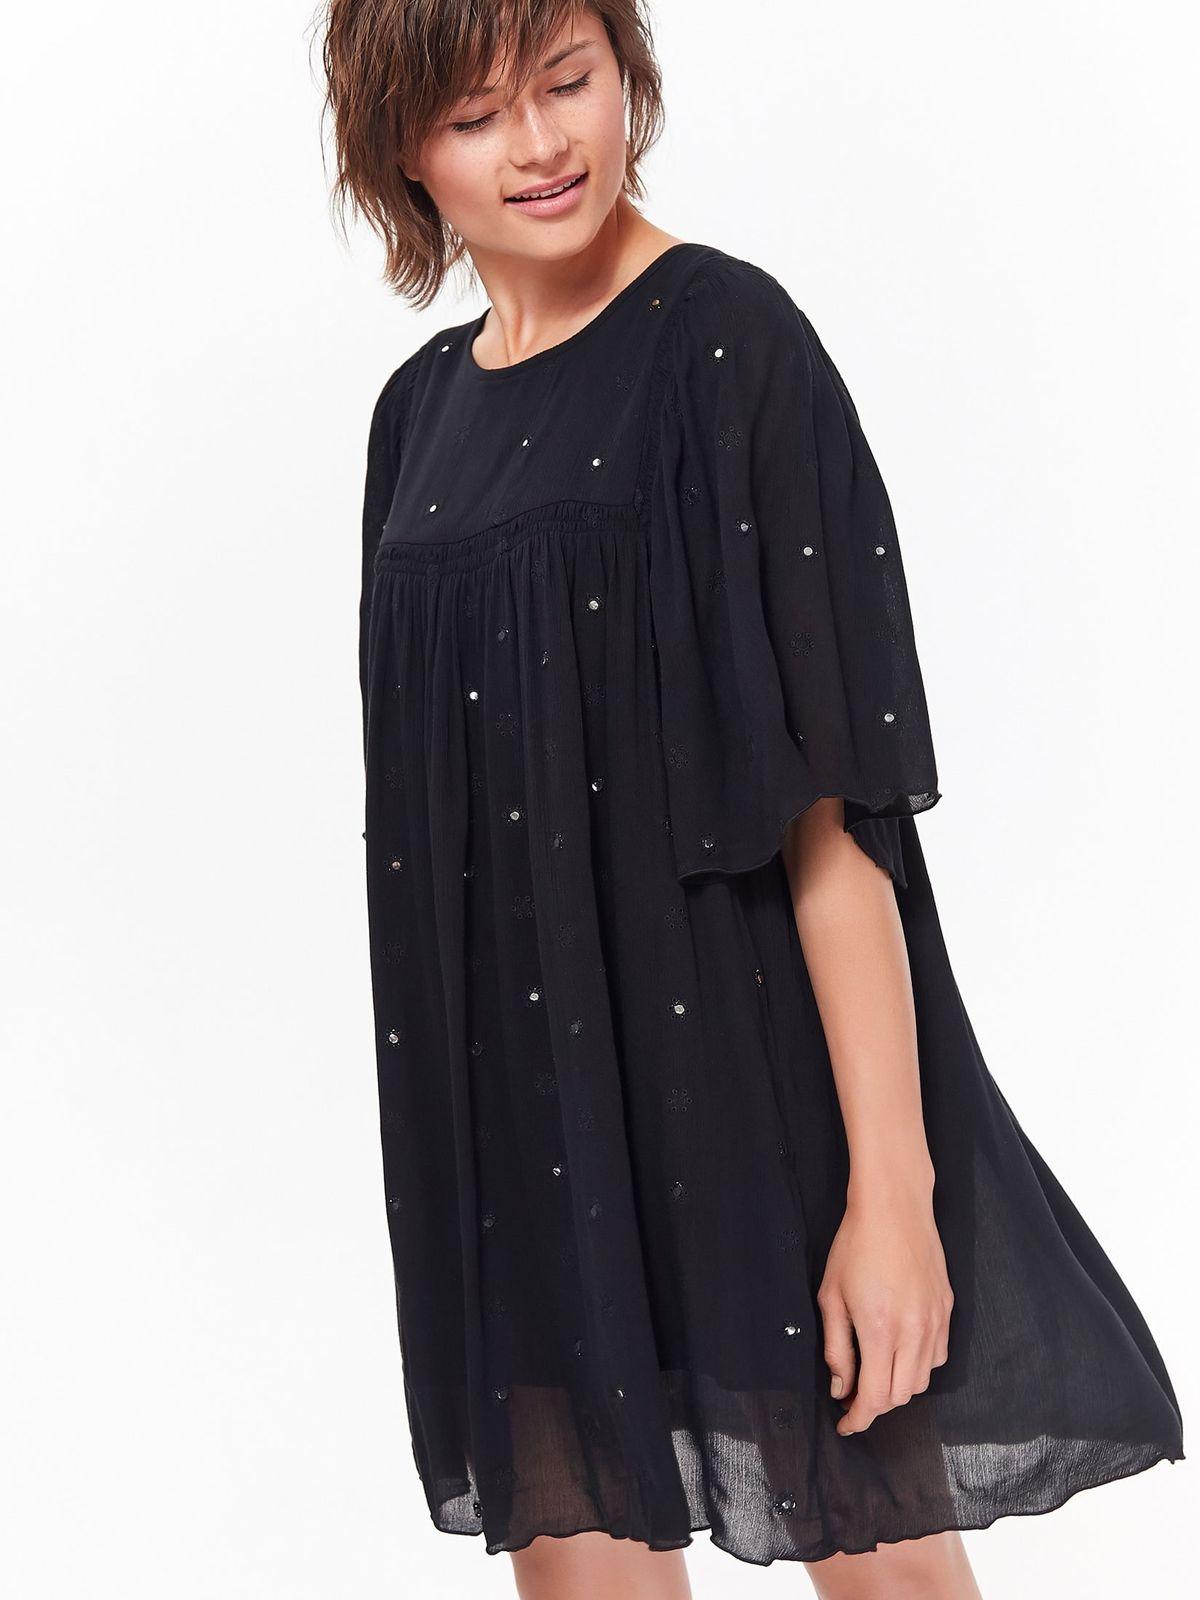 TOP SECRET TOP SECRET φορεμα boho style